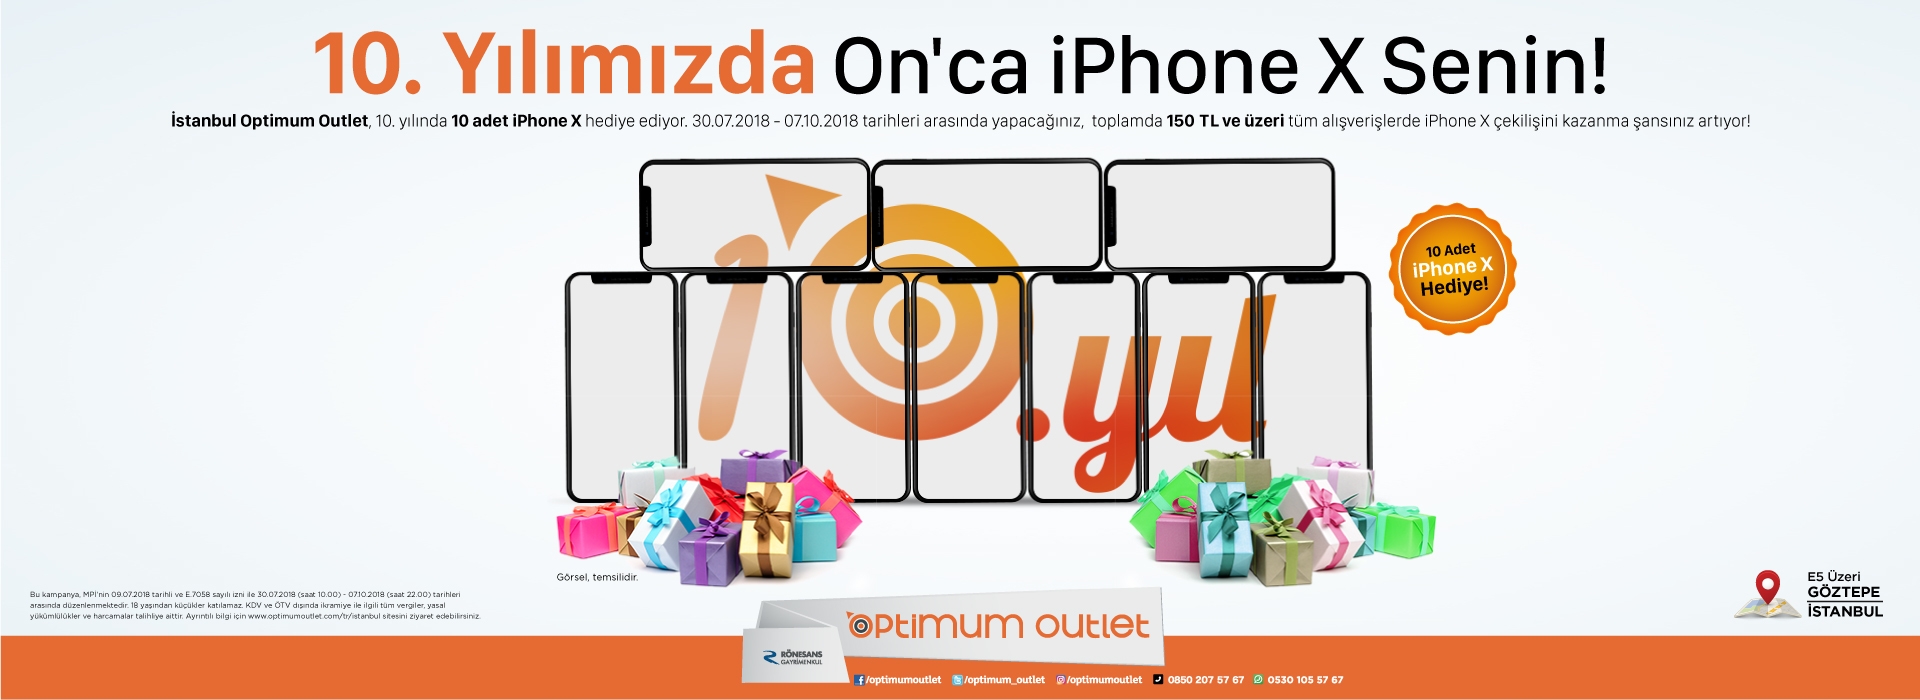 10. yılımızda ON'CA I Phone X Senin!